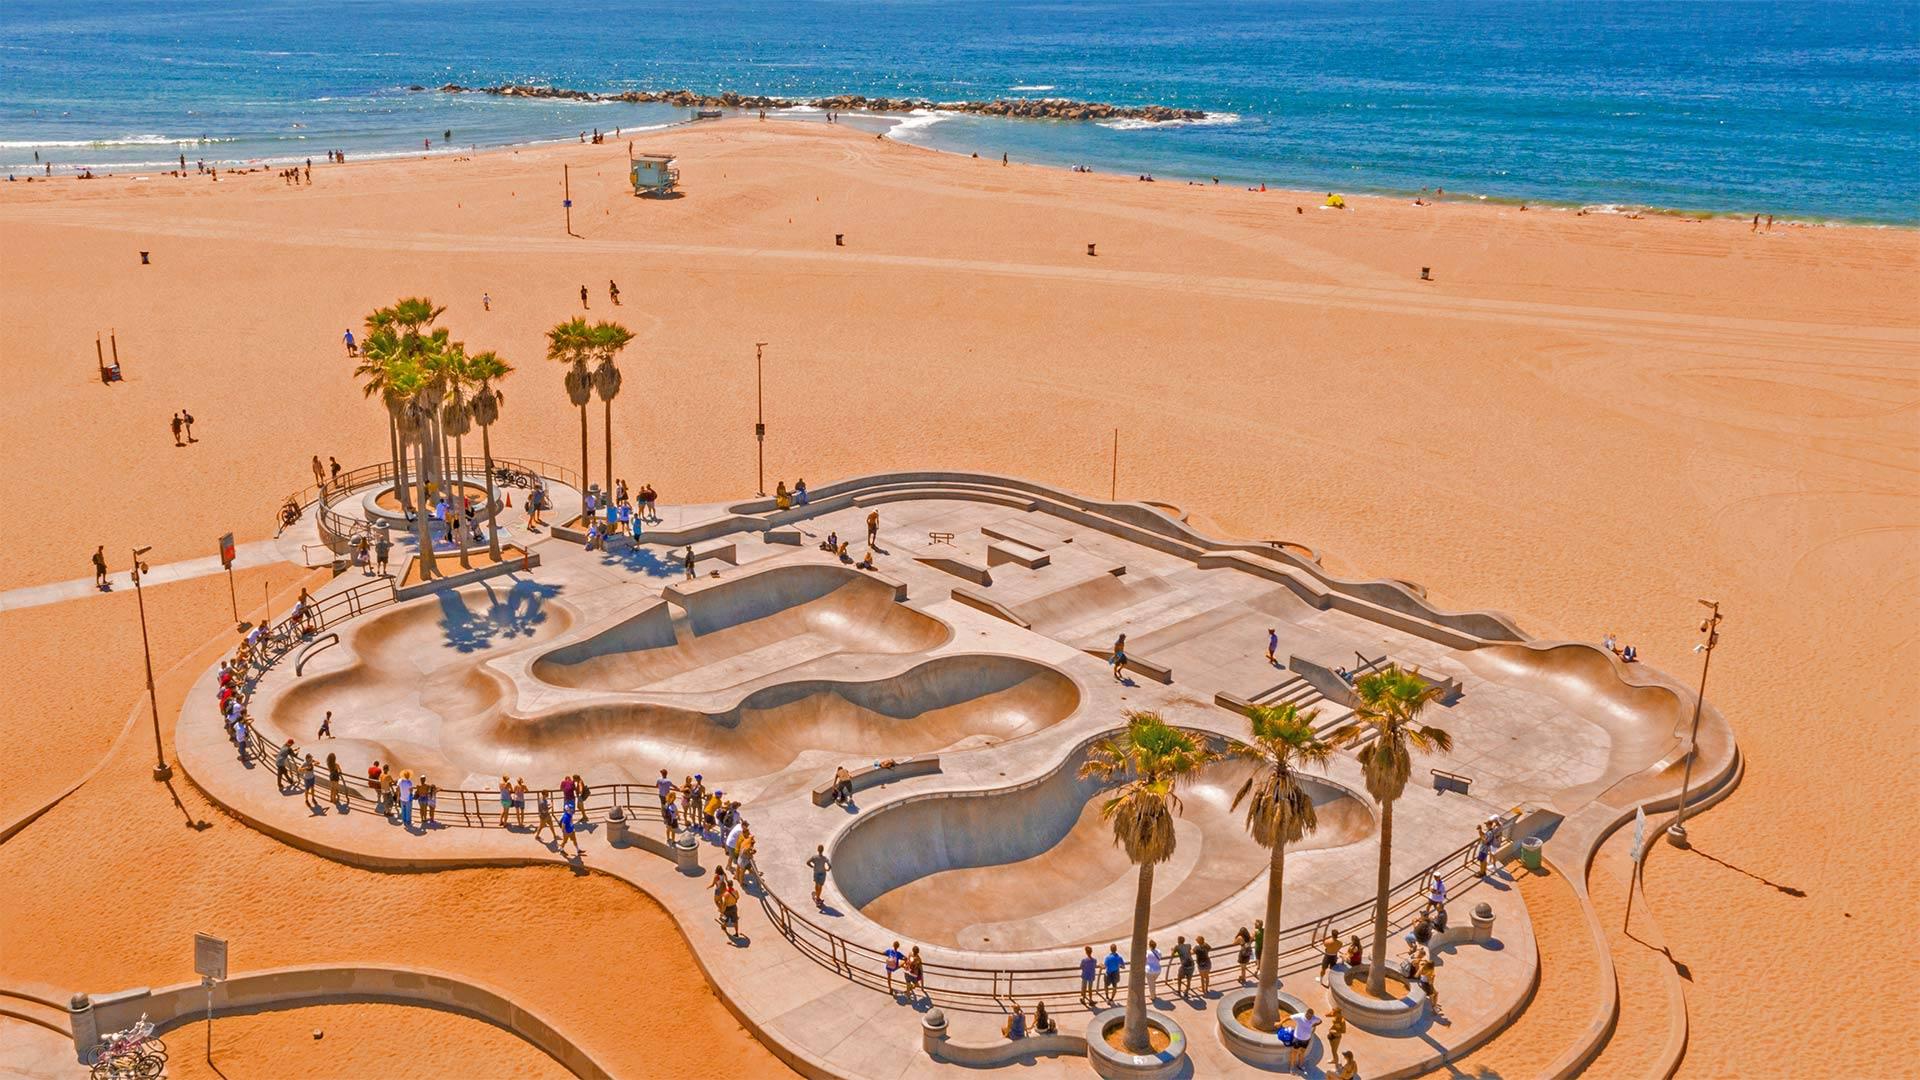 威尼斯海滩滑板公园鸟瞰图,洛杉矶 (© Ingus Kruklitis/Getty Images)